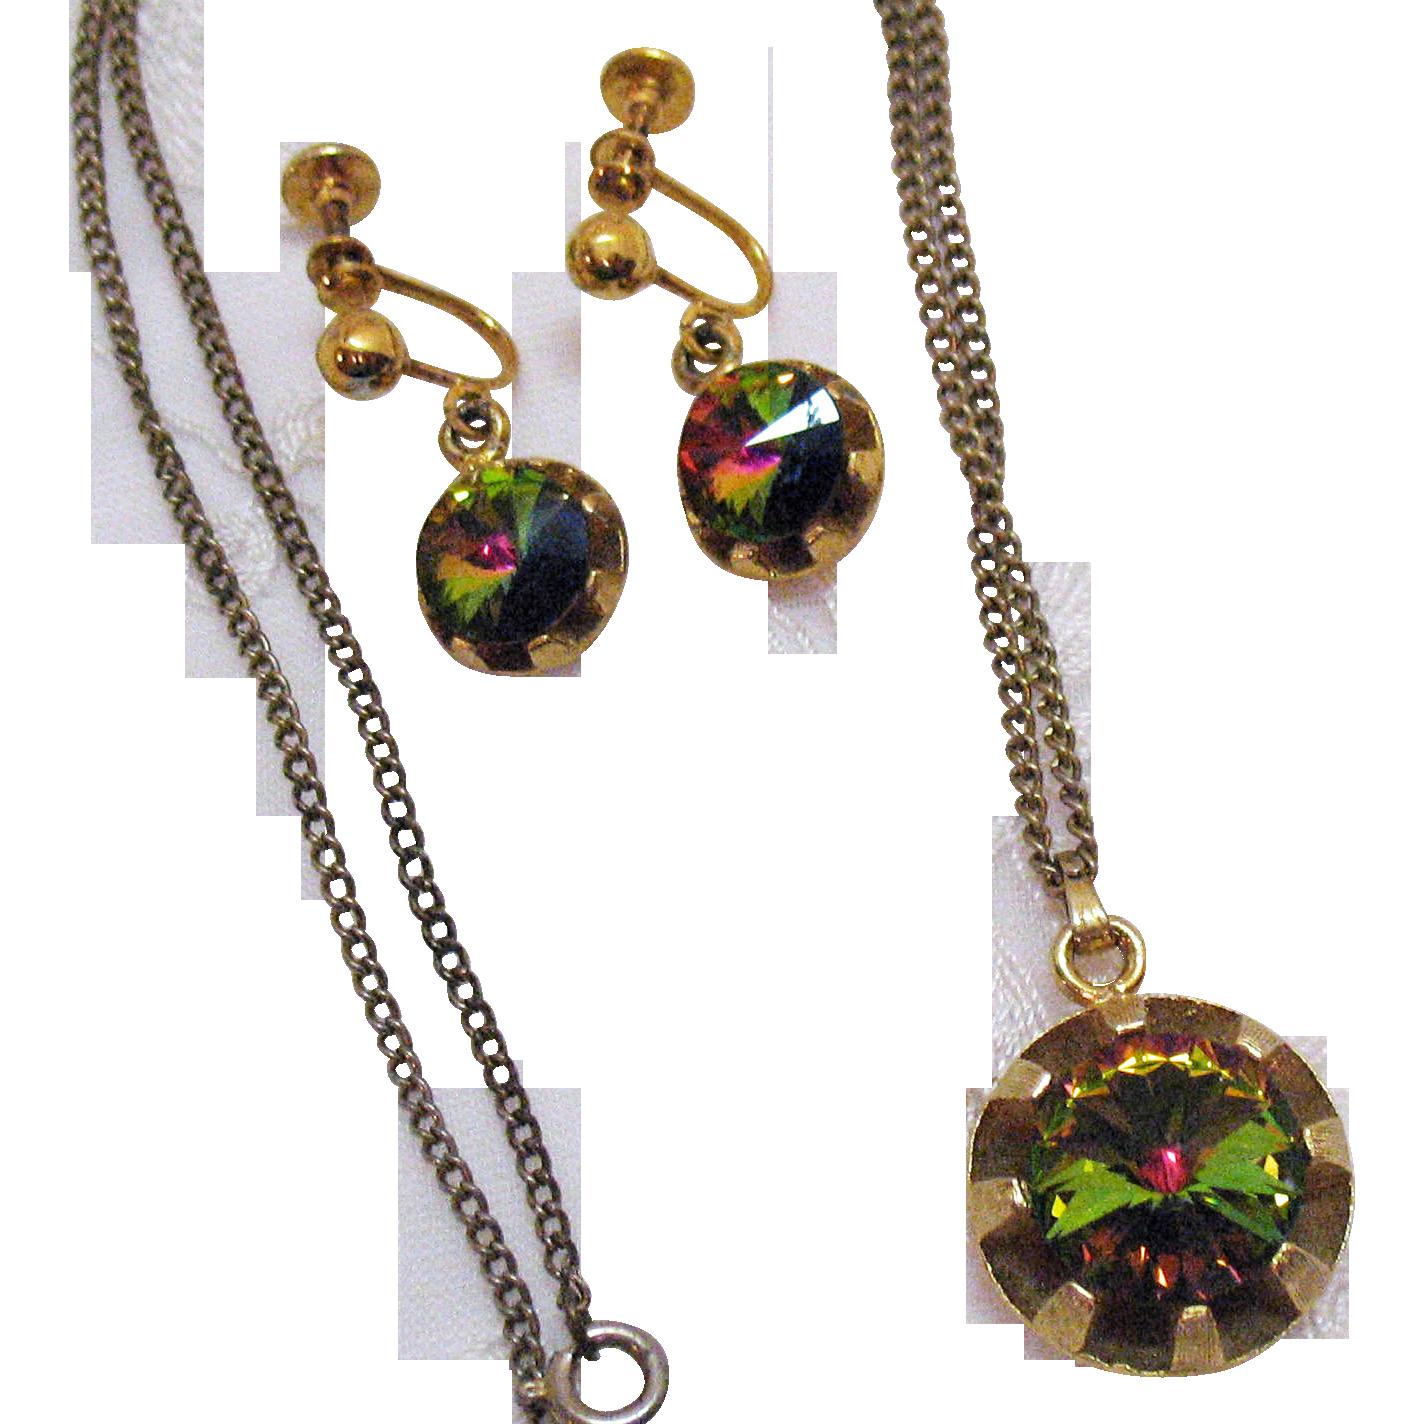 50% Off Signed Vintage Watermelon Rivoli Rhinestone Necklace Earrings Set